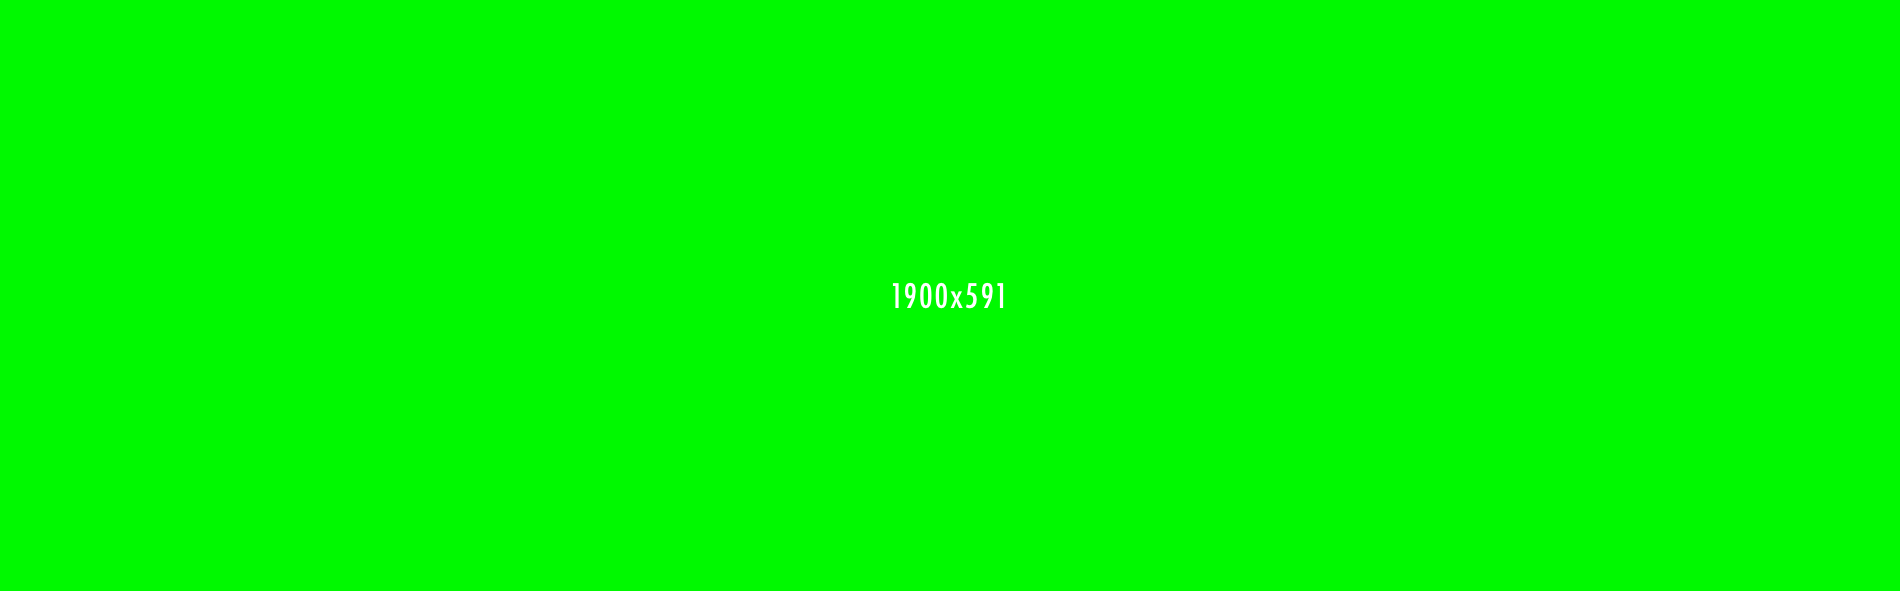 slider1-150x150.png